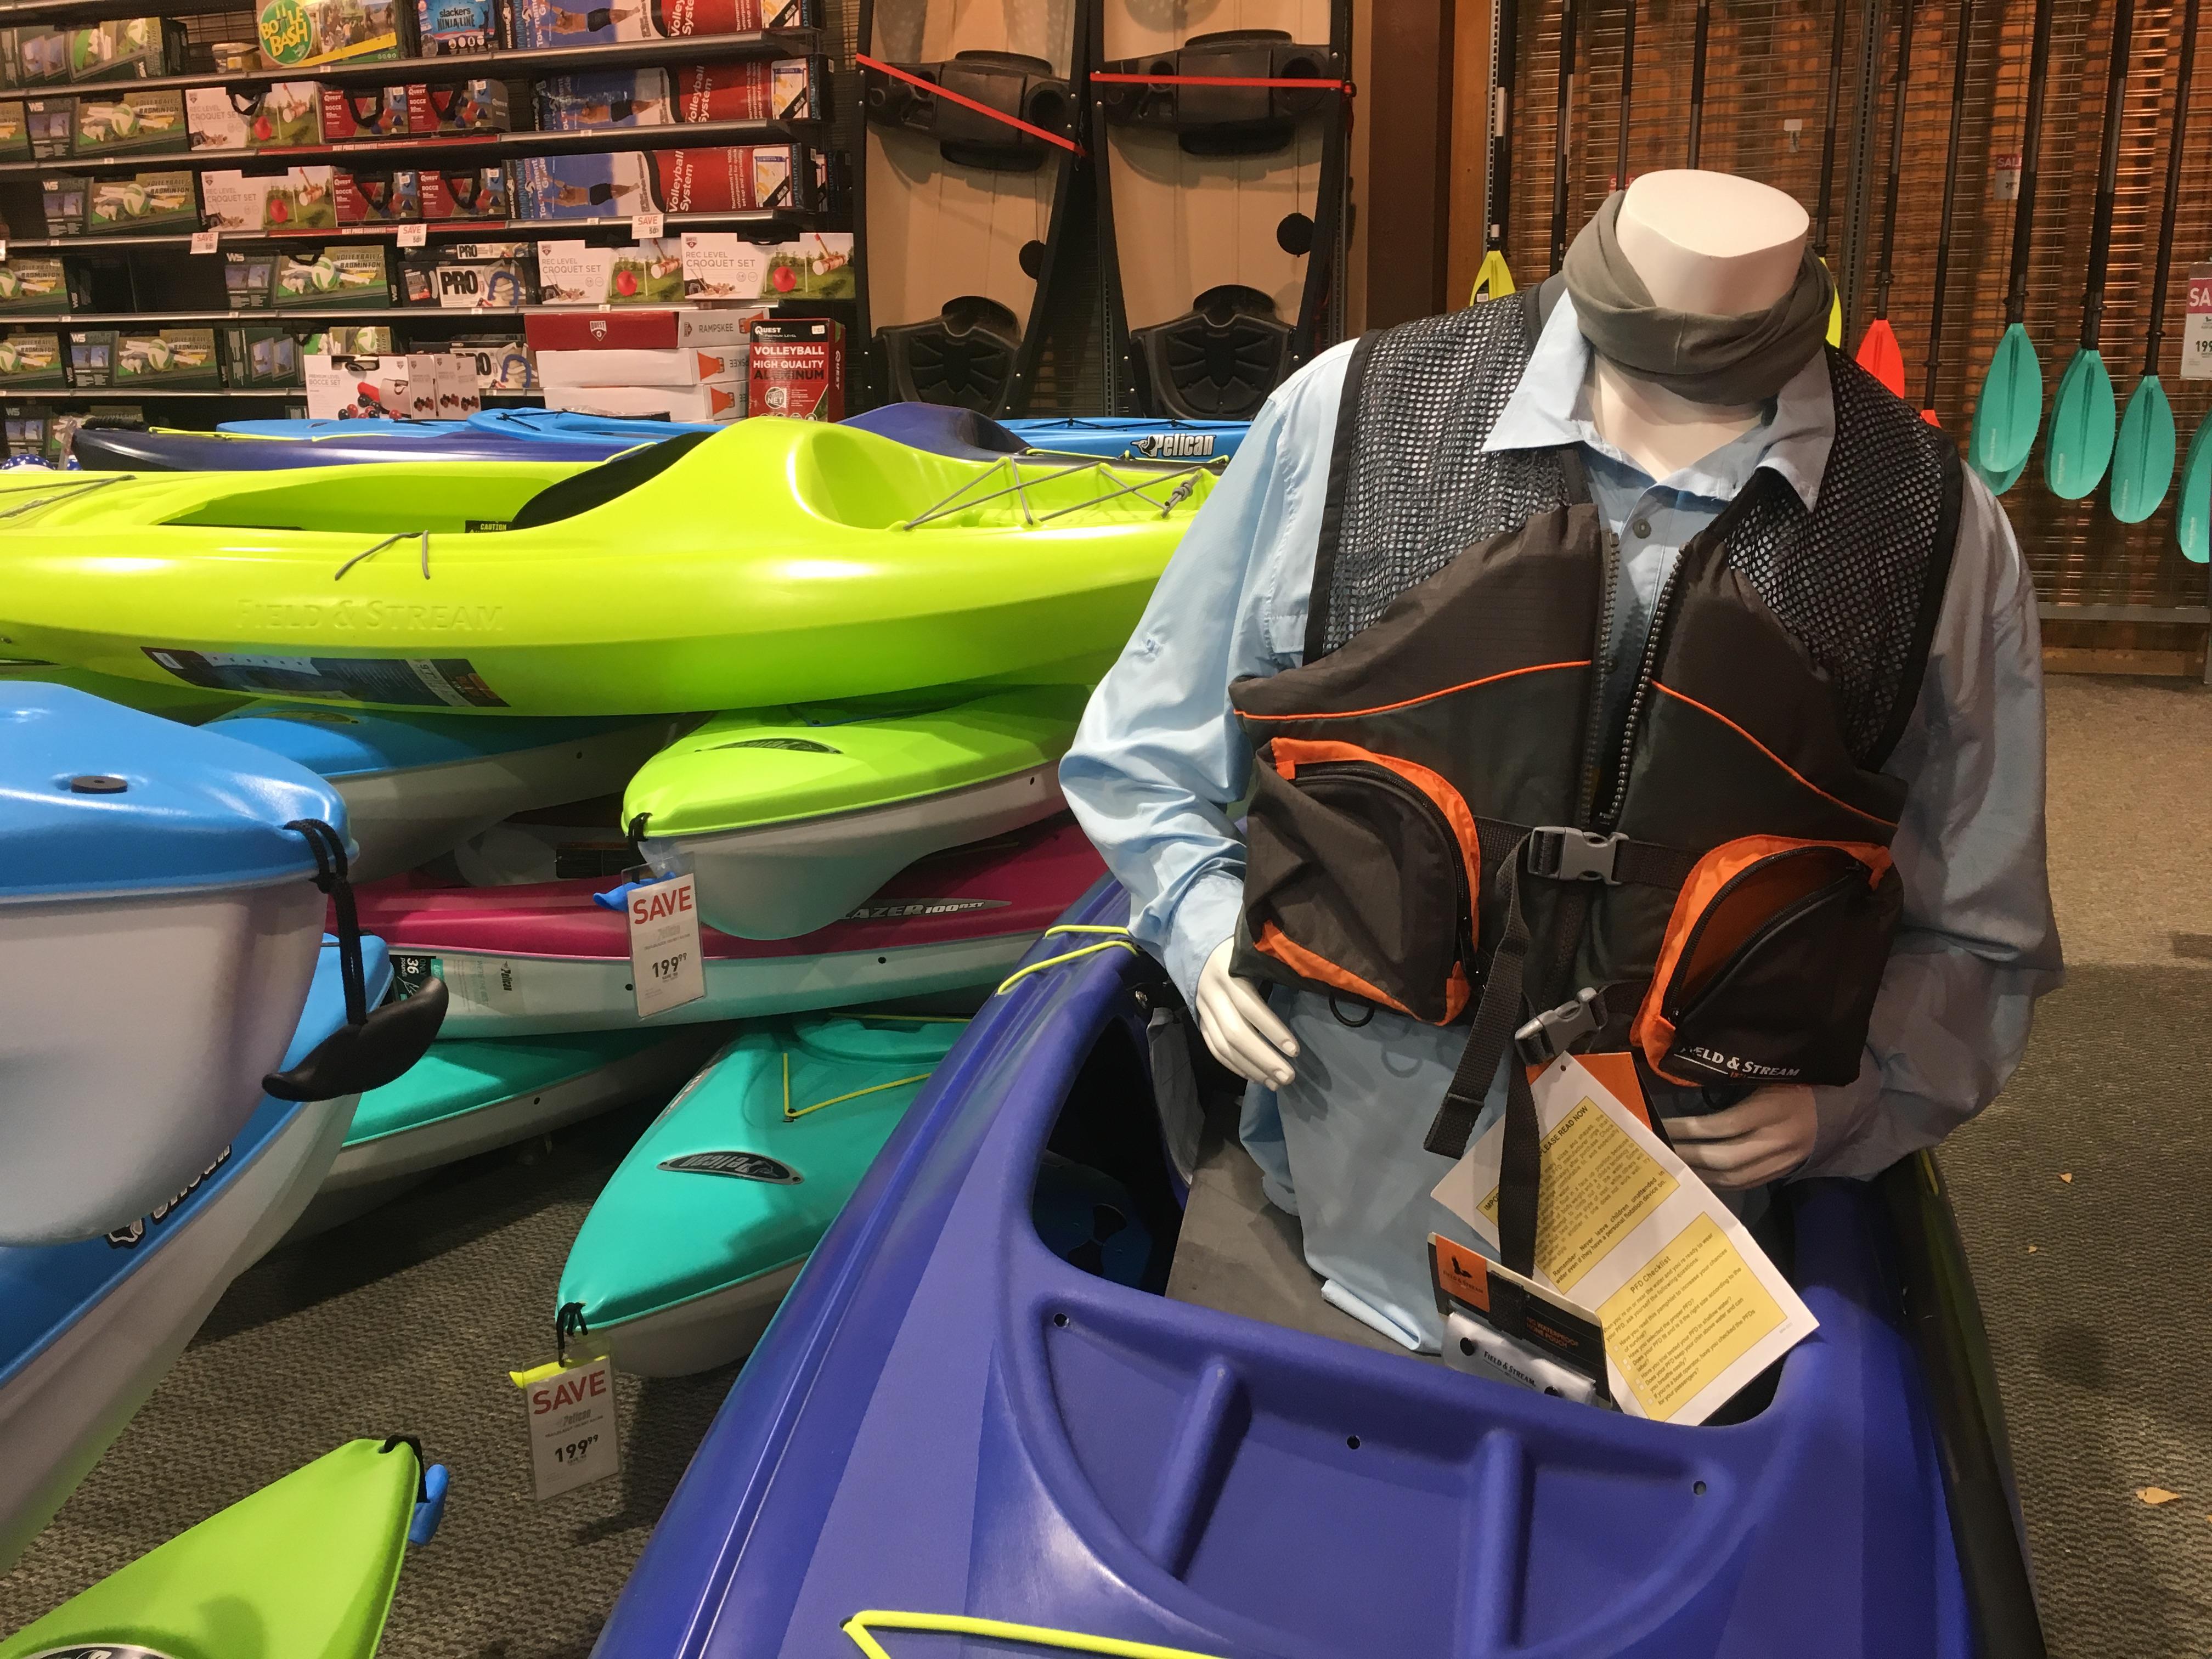 dicks sporting good kayak